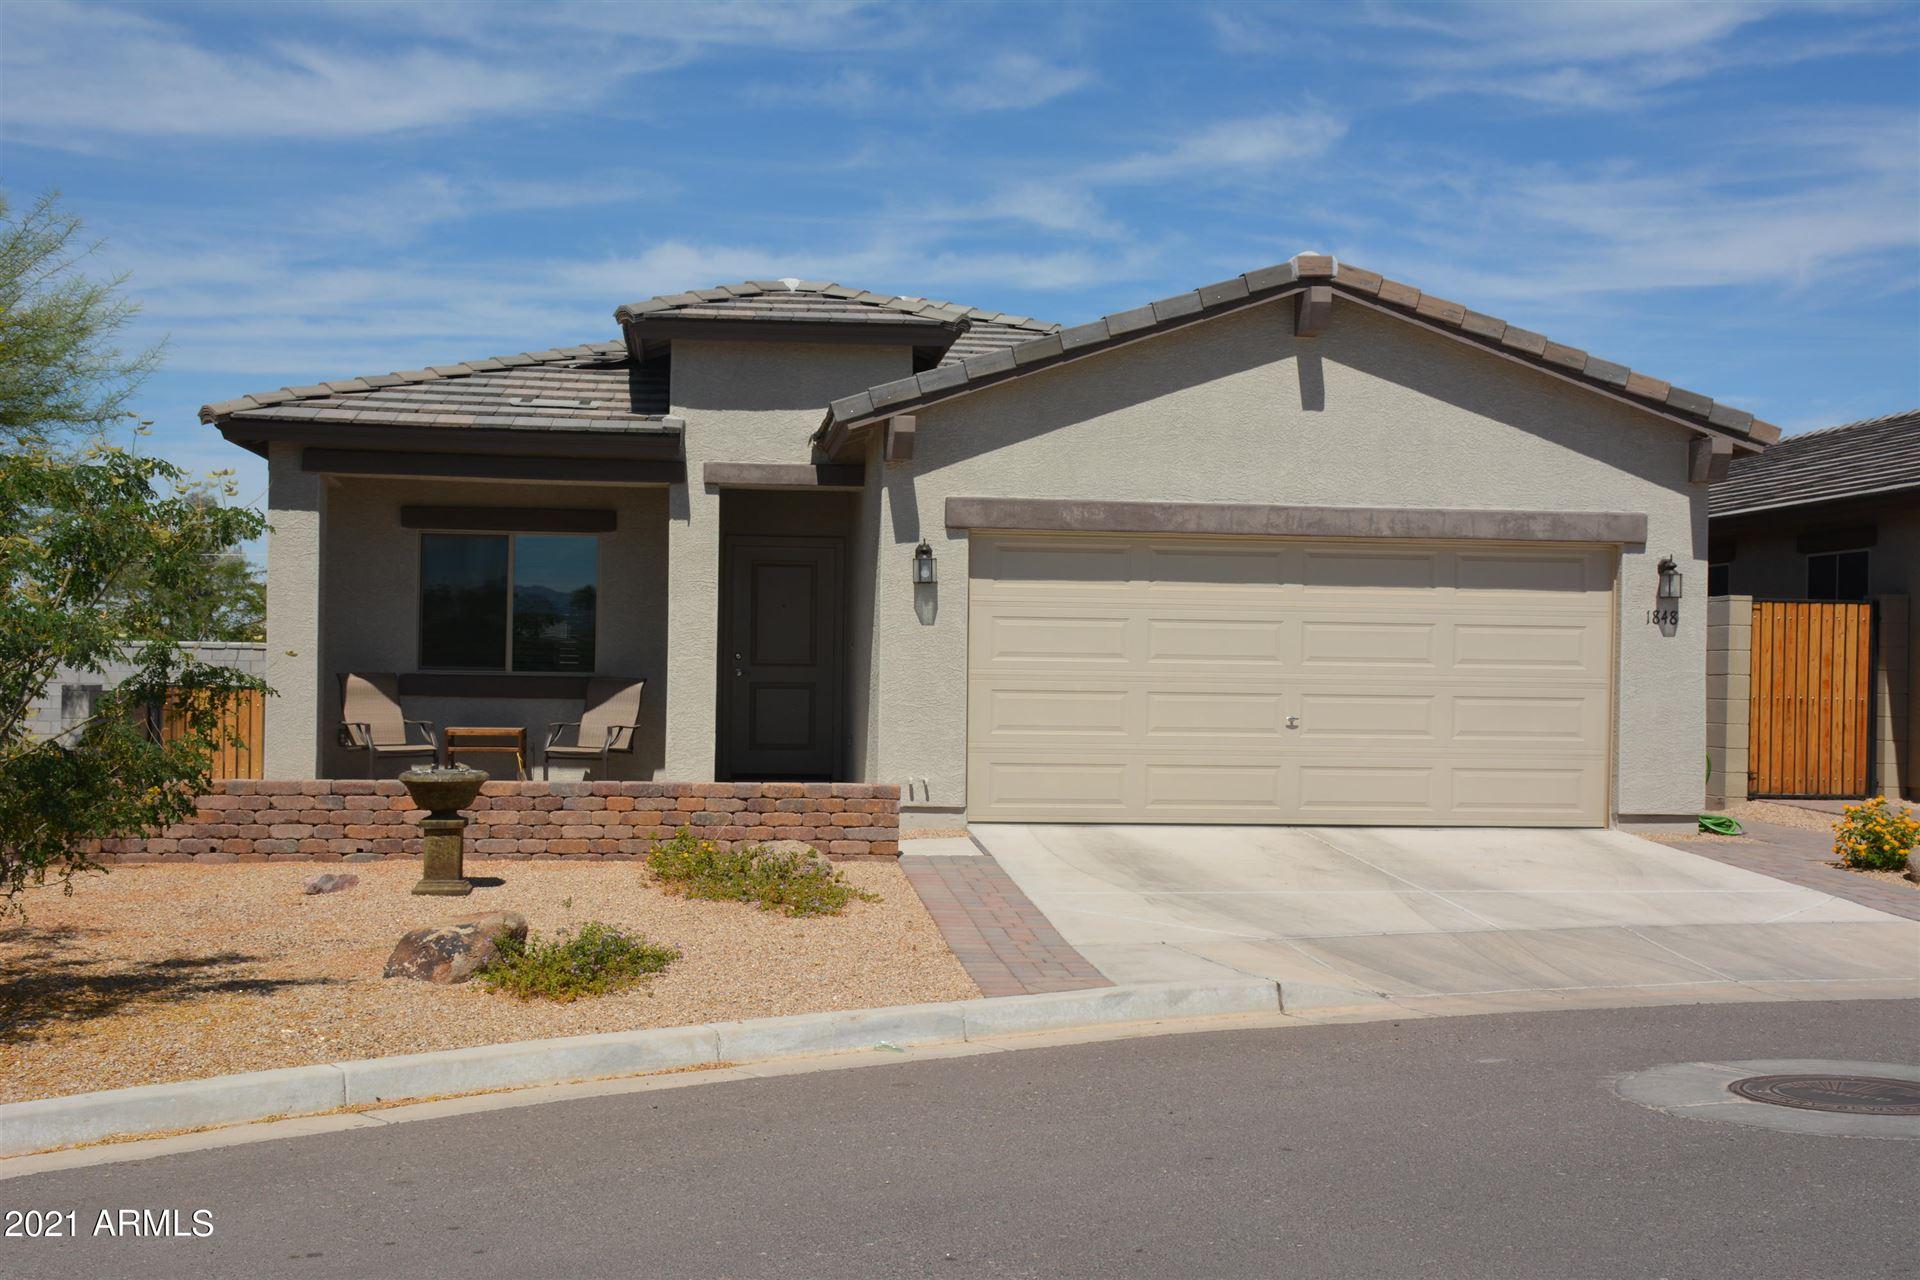 Photo of 1848 S DESCANSO Road, Apache Junction, AZ 85119 (MLS # 6248637)